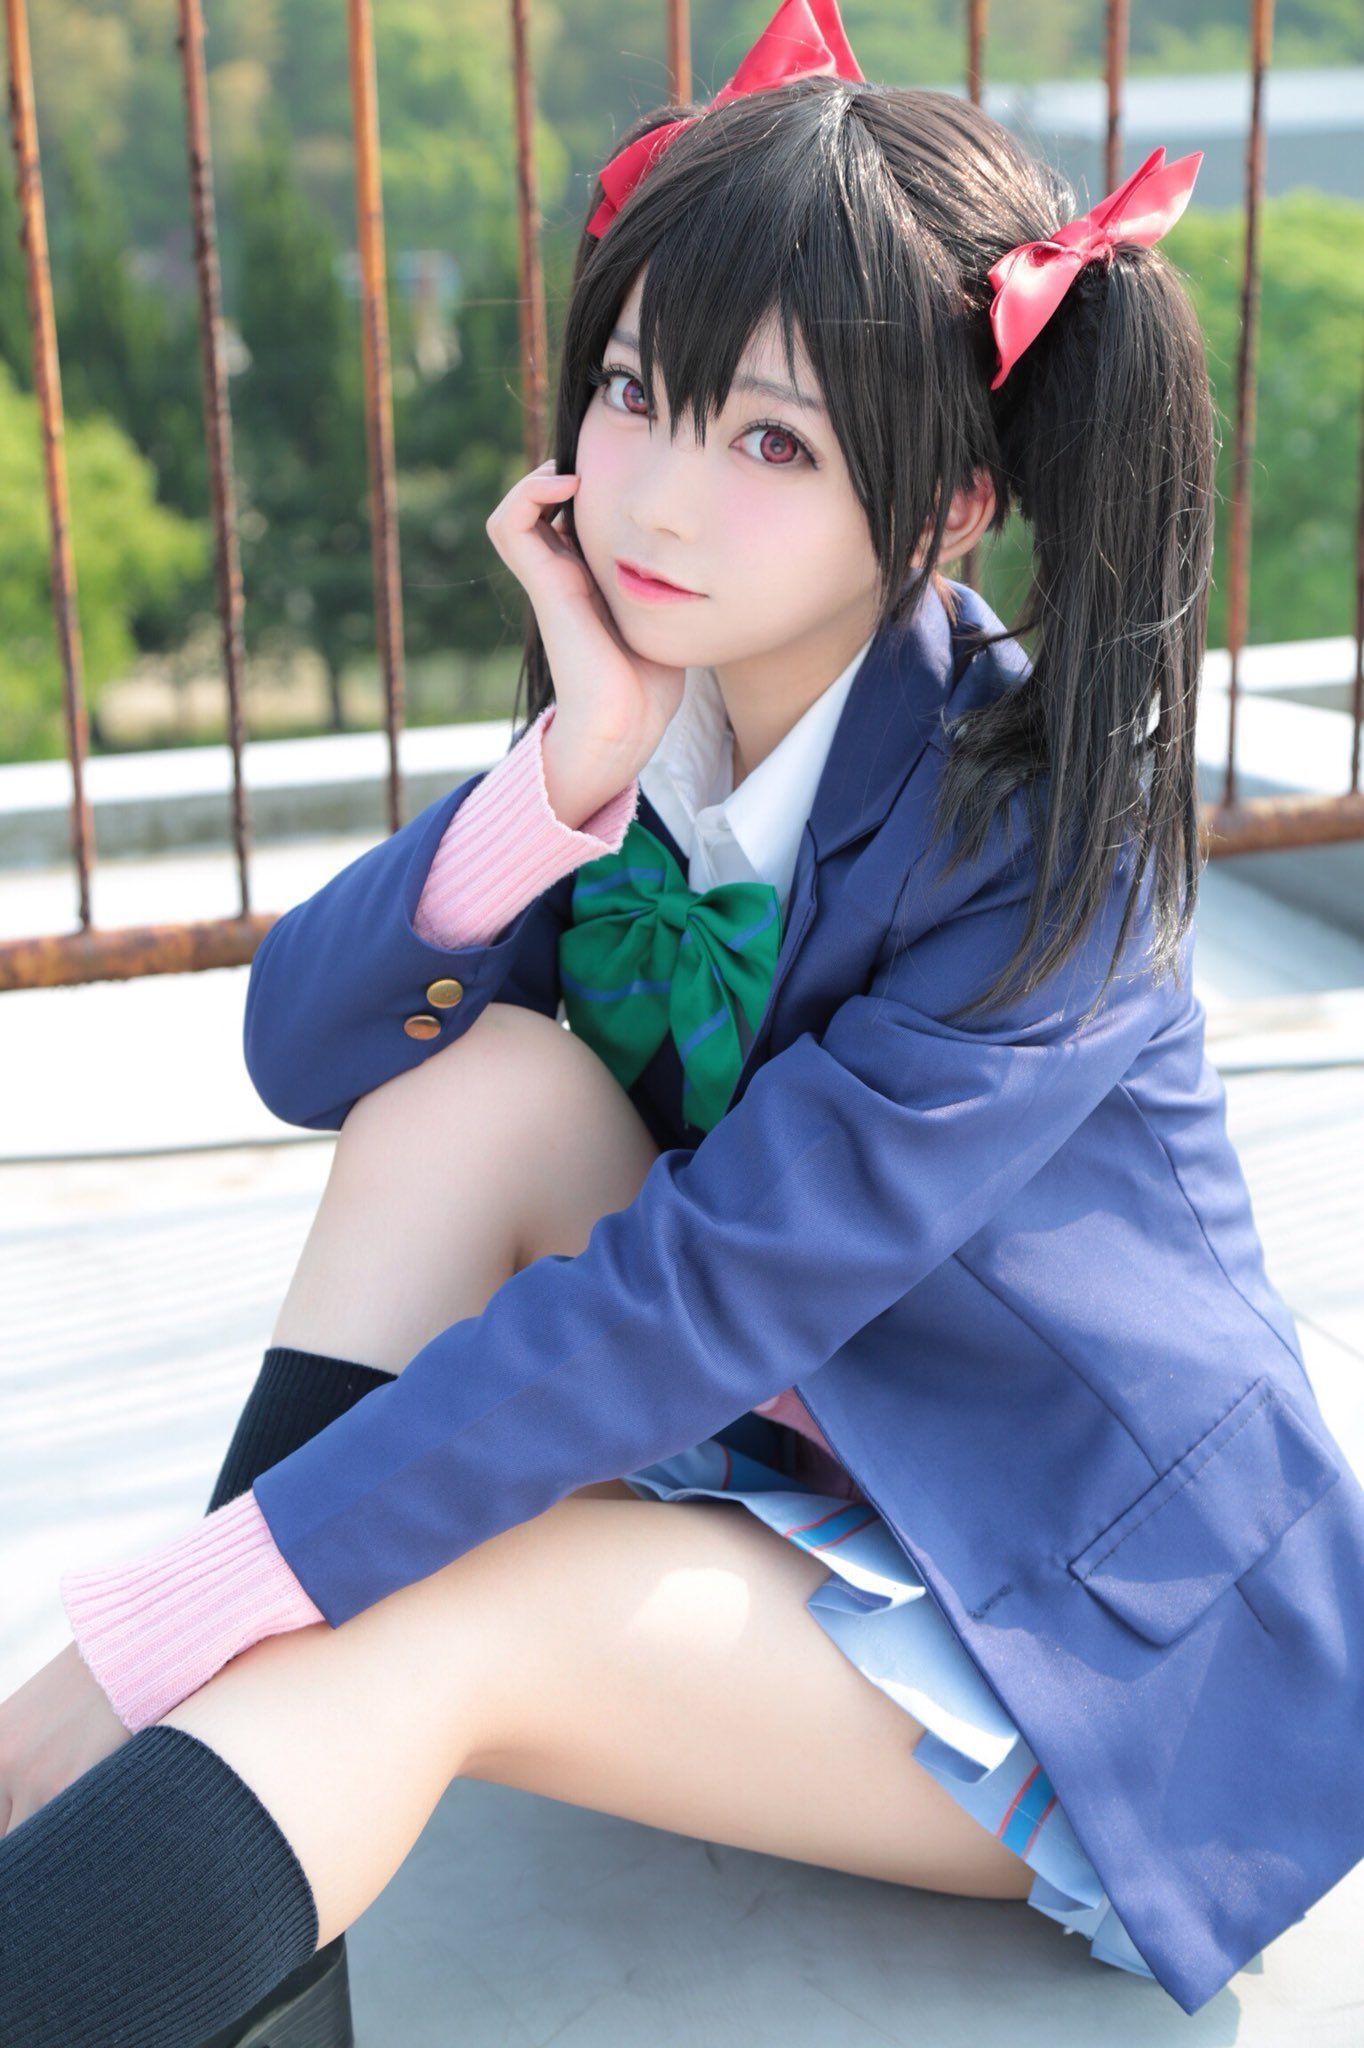 Épinglé sur Asia Girl in latex